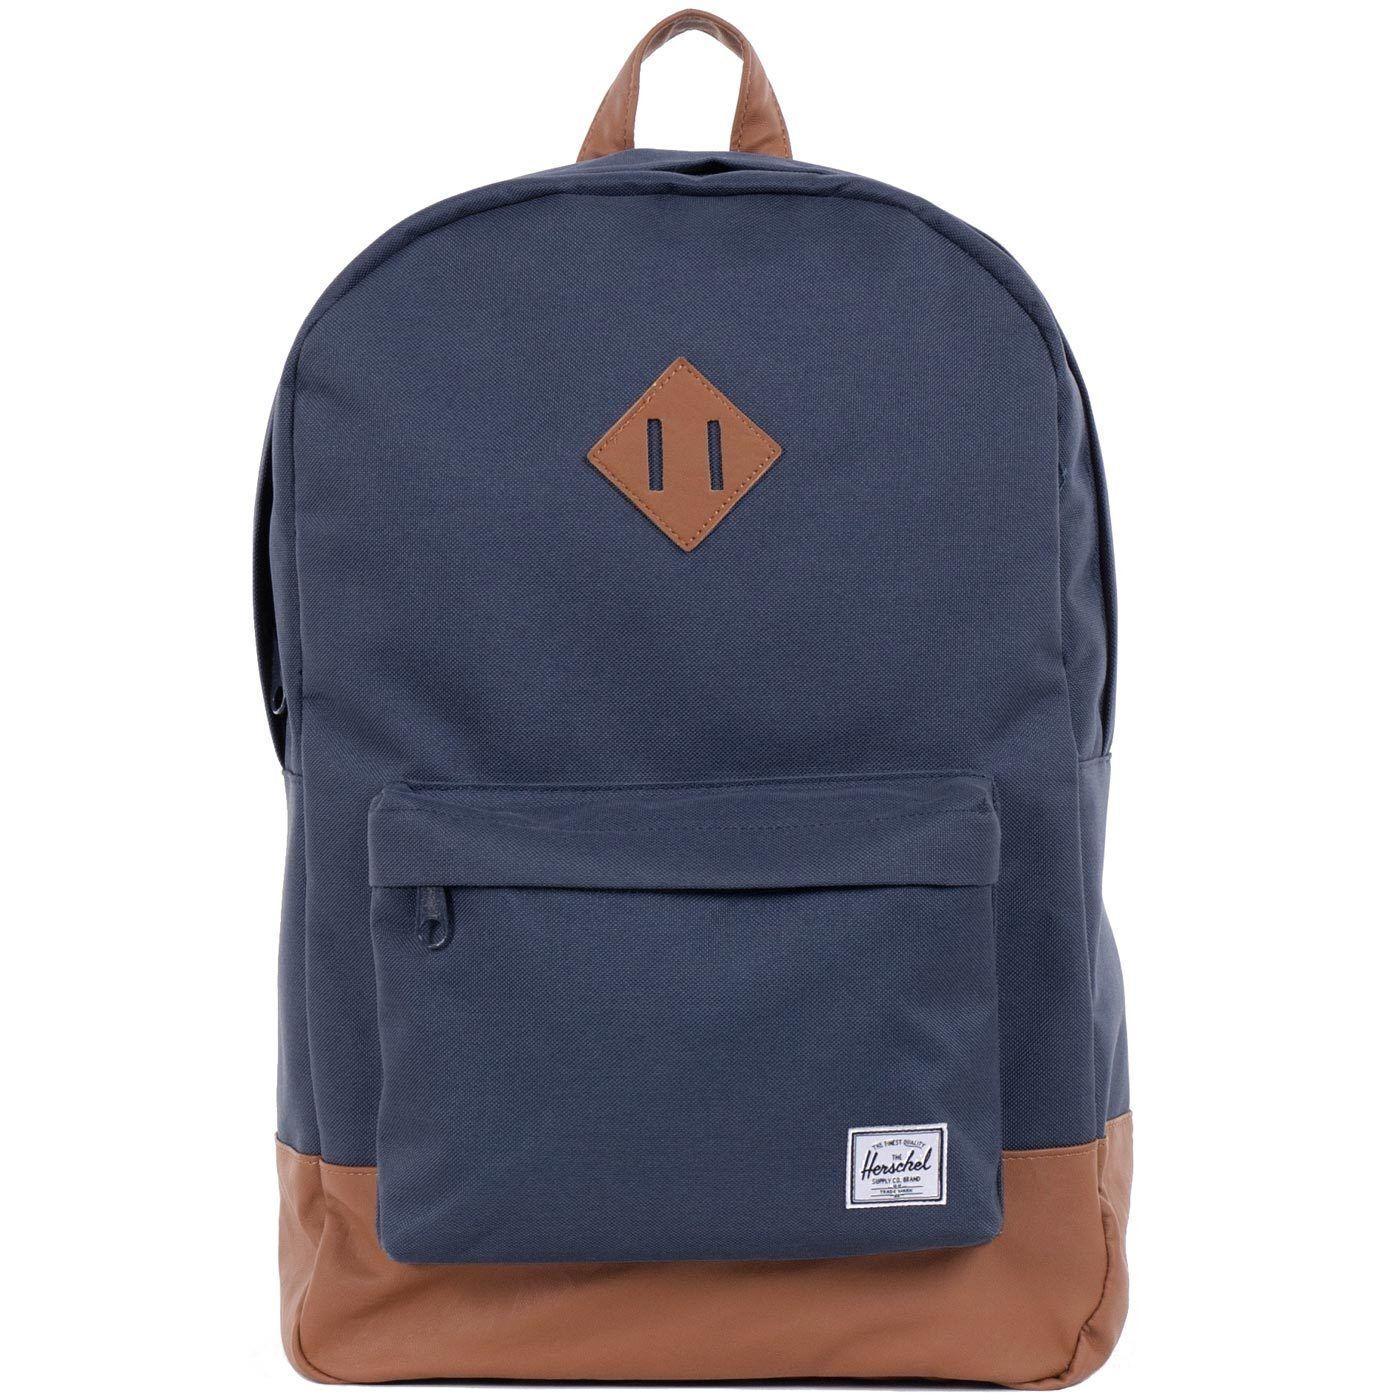 Best Cheap Backpacks